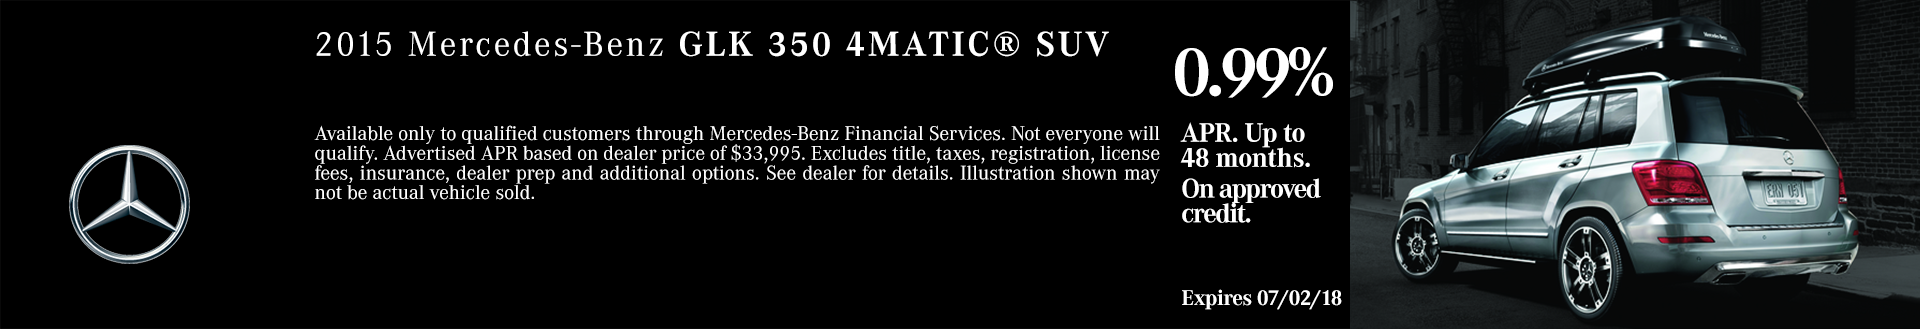 2015 Mercedes GLK 350 Suv For Sale Boise